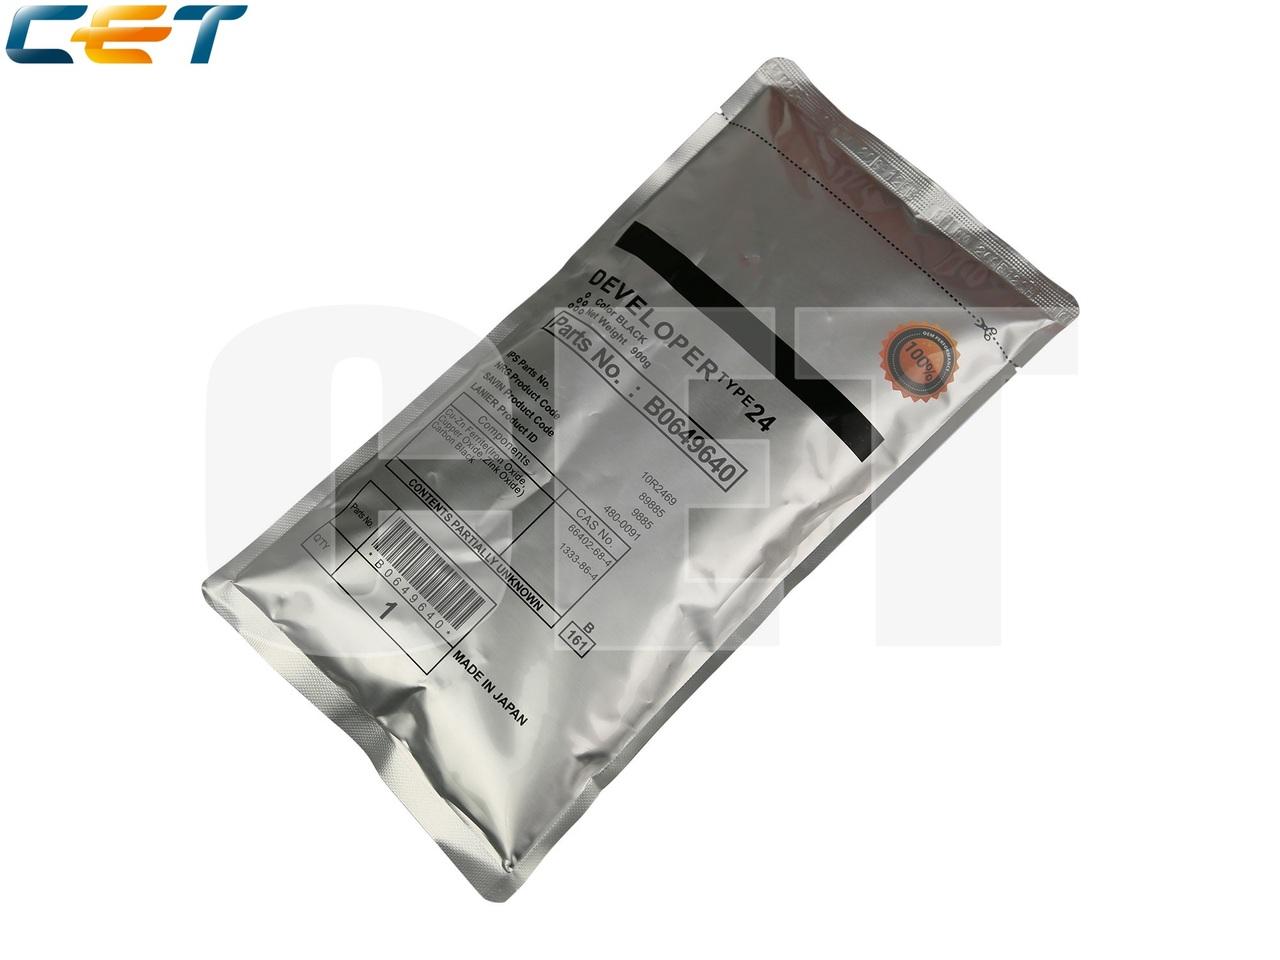 Девелопер Type 24 для RICOH Aficio1060/1075/2051/2060/2075/MP5500/MP6000/MP6500/MP7000/MP7500 (CET), 900г/пак, 350000 стр., CET8106N